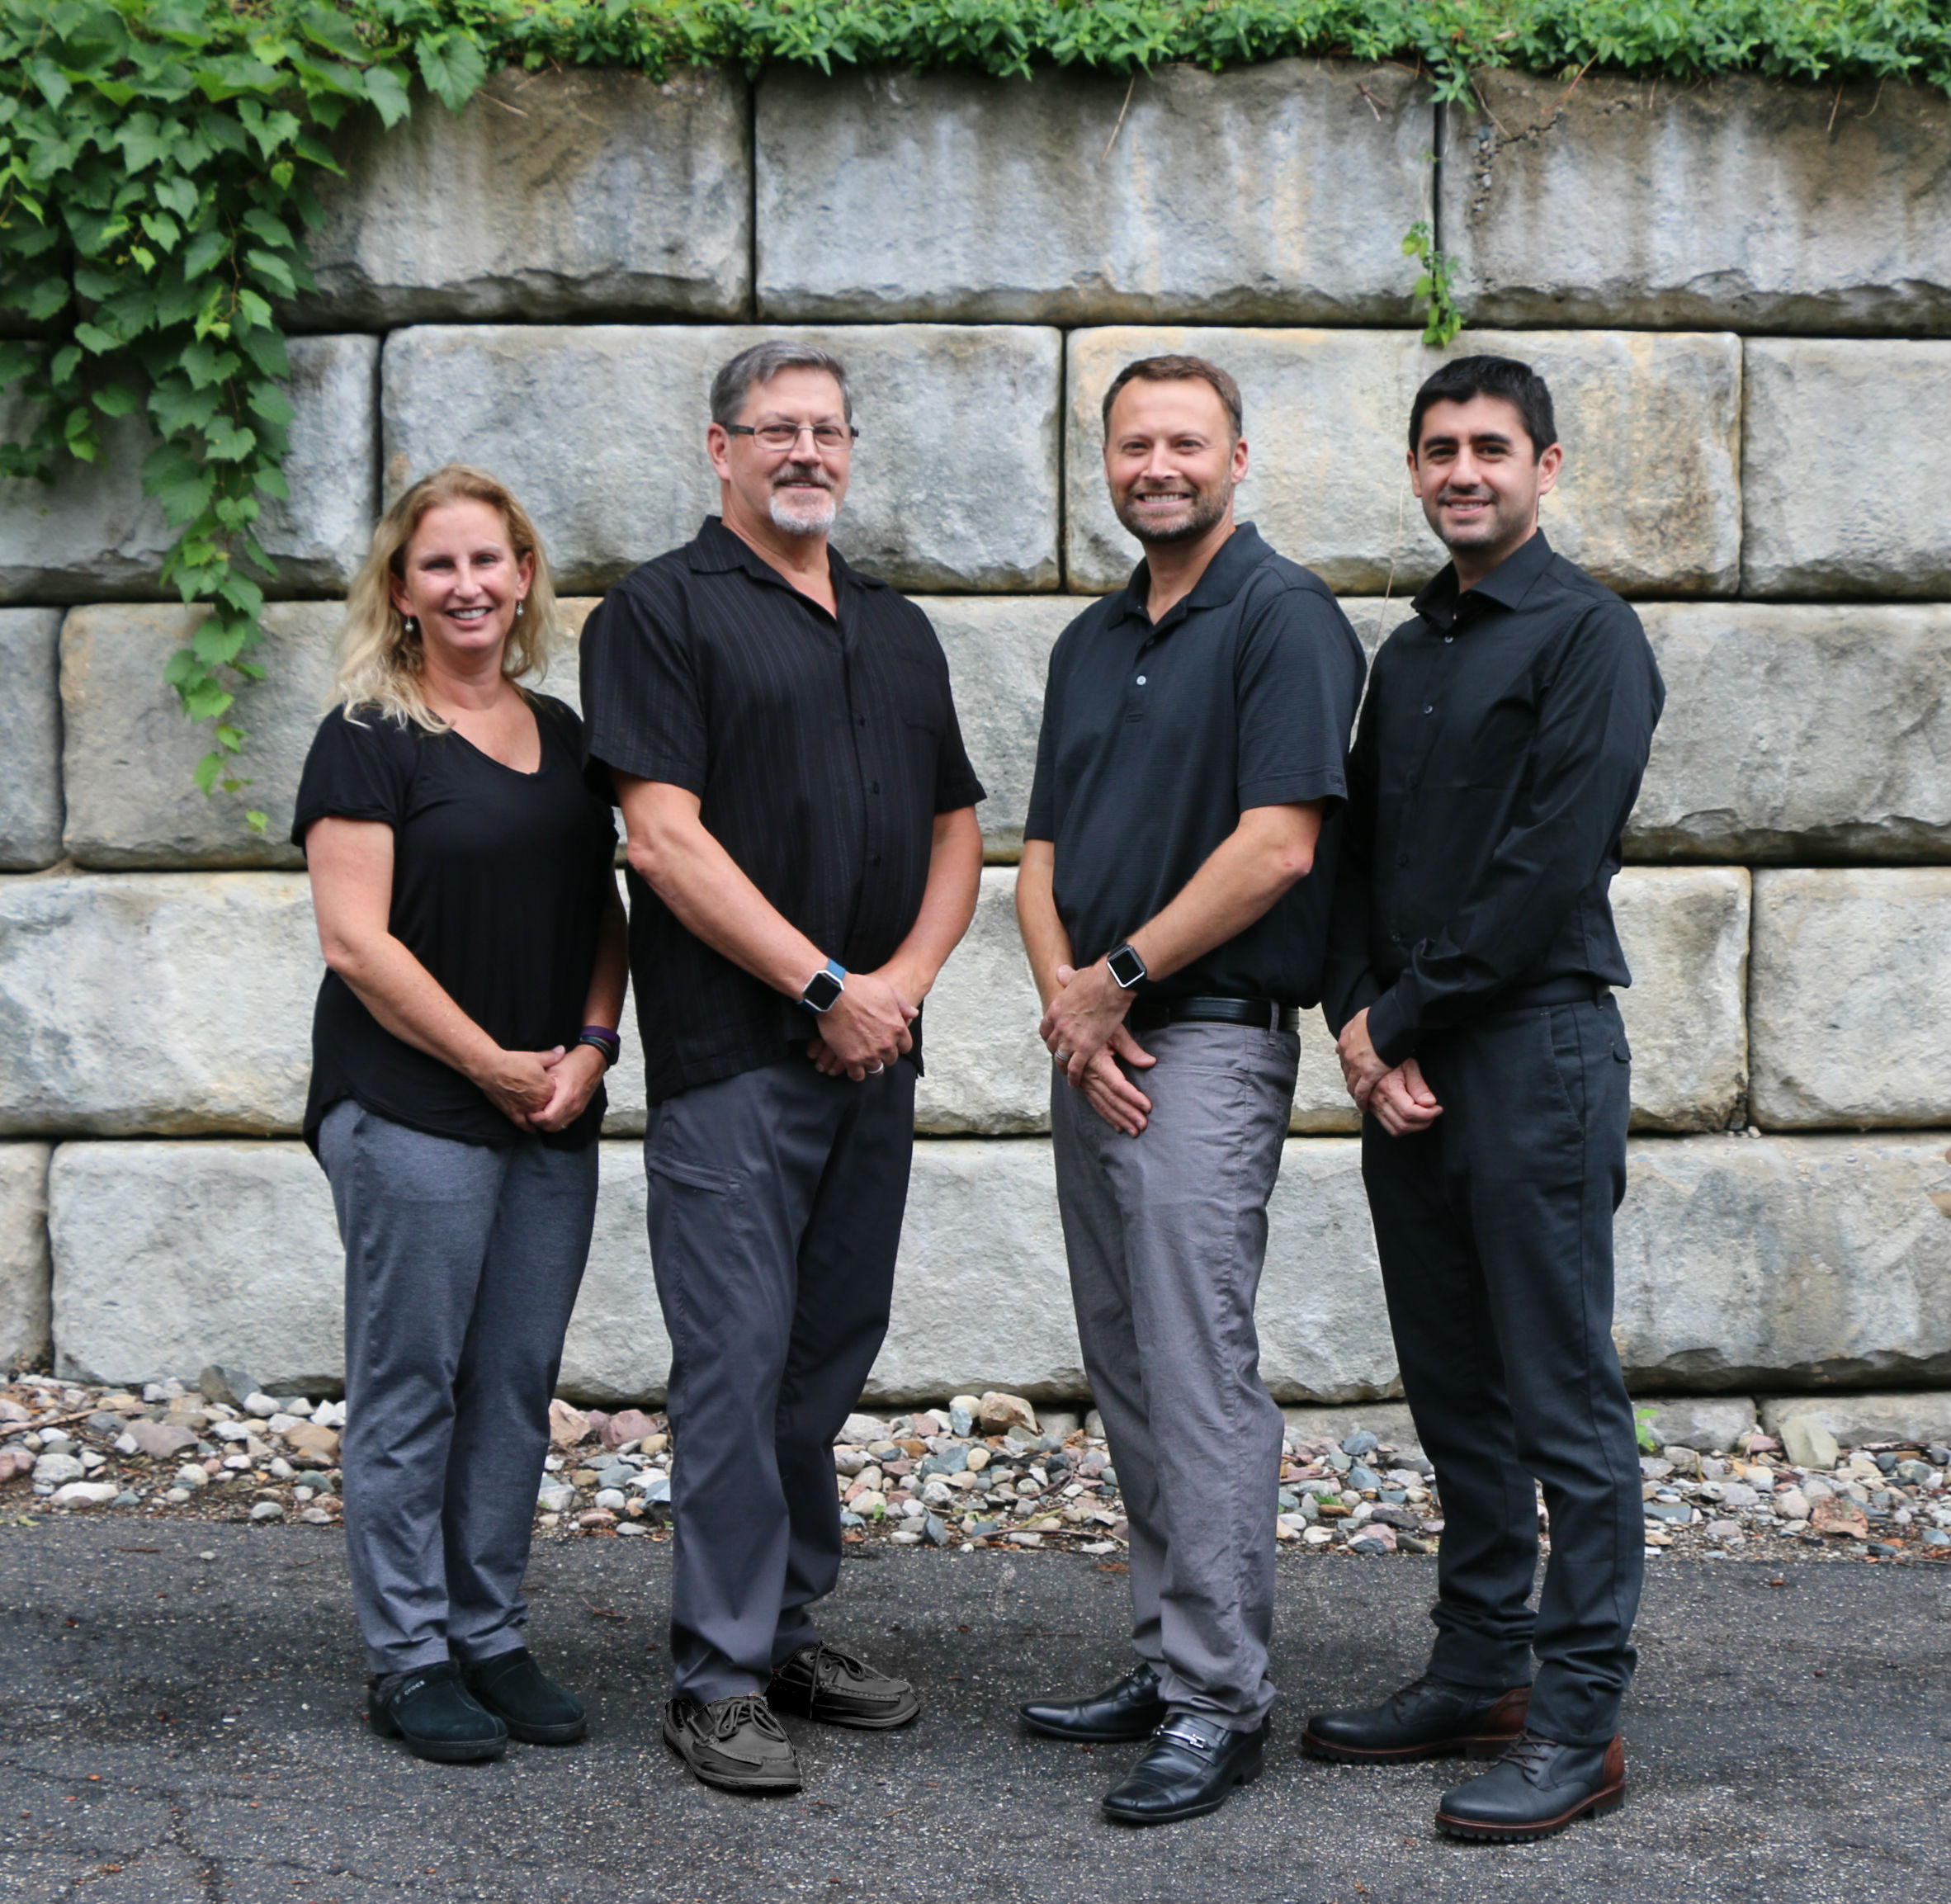 Our Dental Team in Milford, MI | Village Dental of Milford